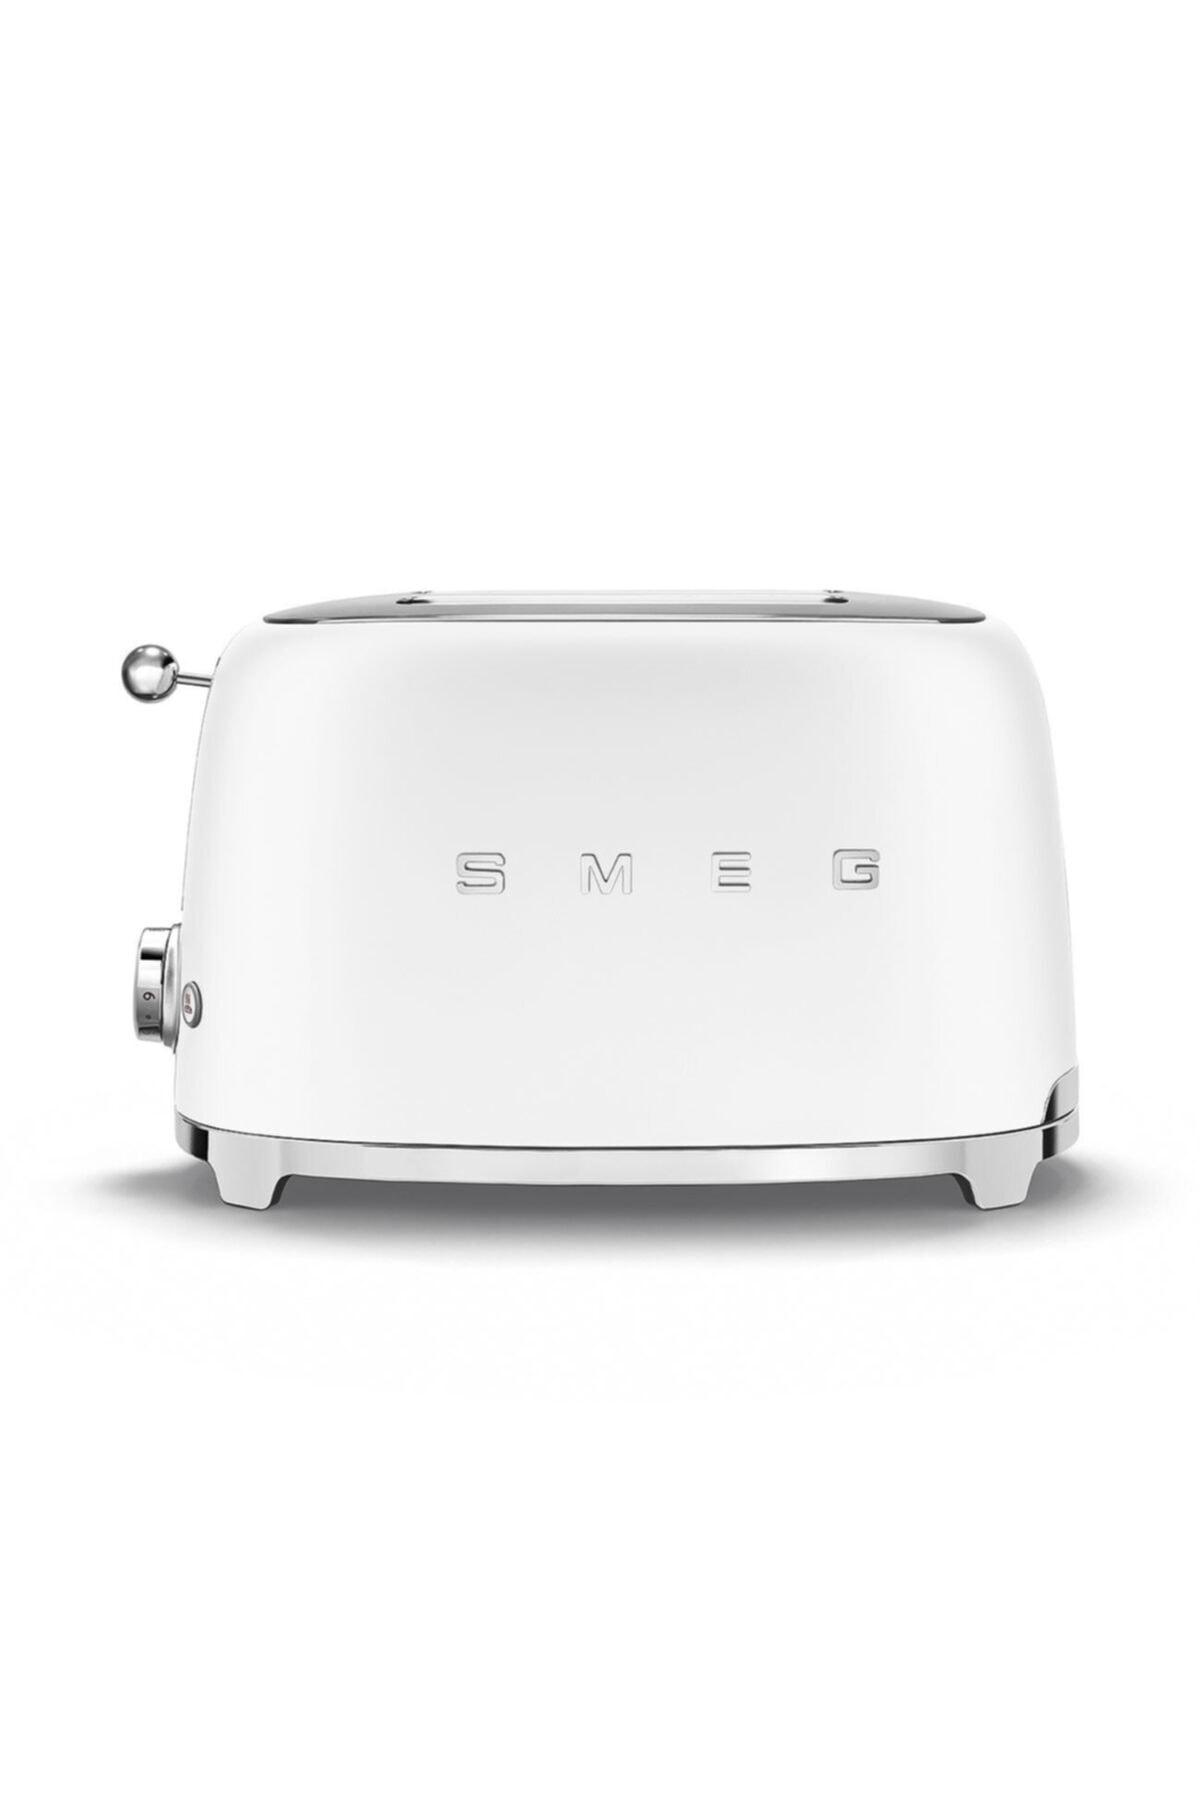 SMEG Mat Beyaz Retro 2x1 Ekmek Kızartma Makinesi 1